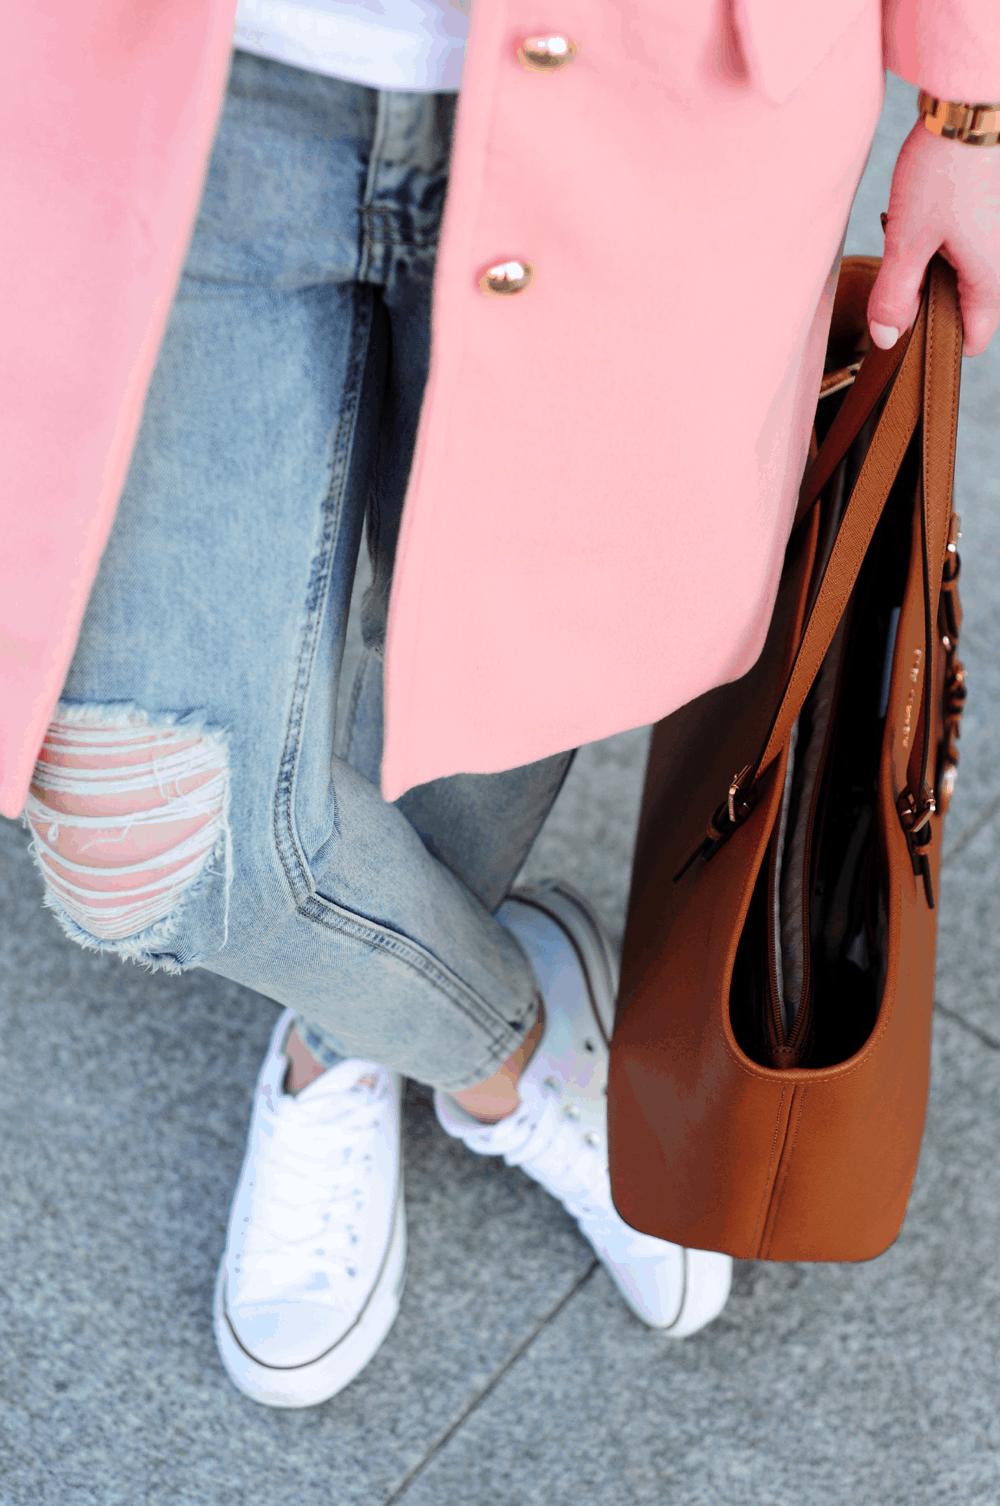 podarte jeansy białe conversy